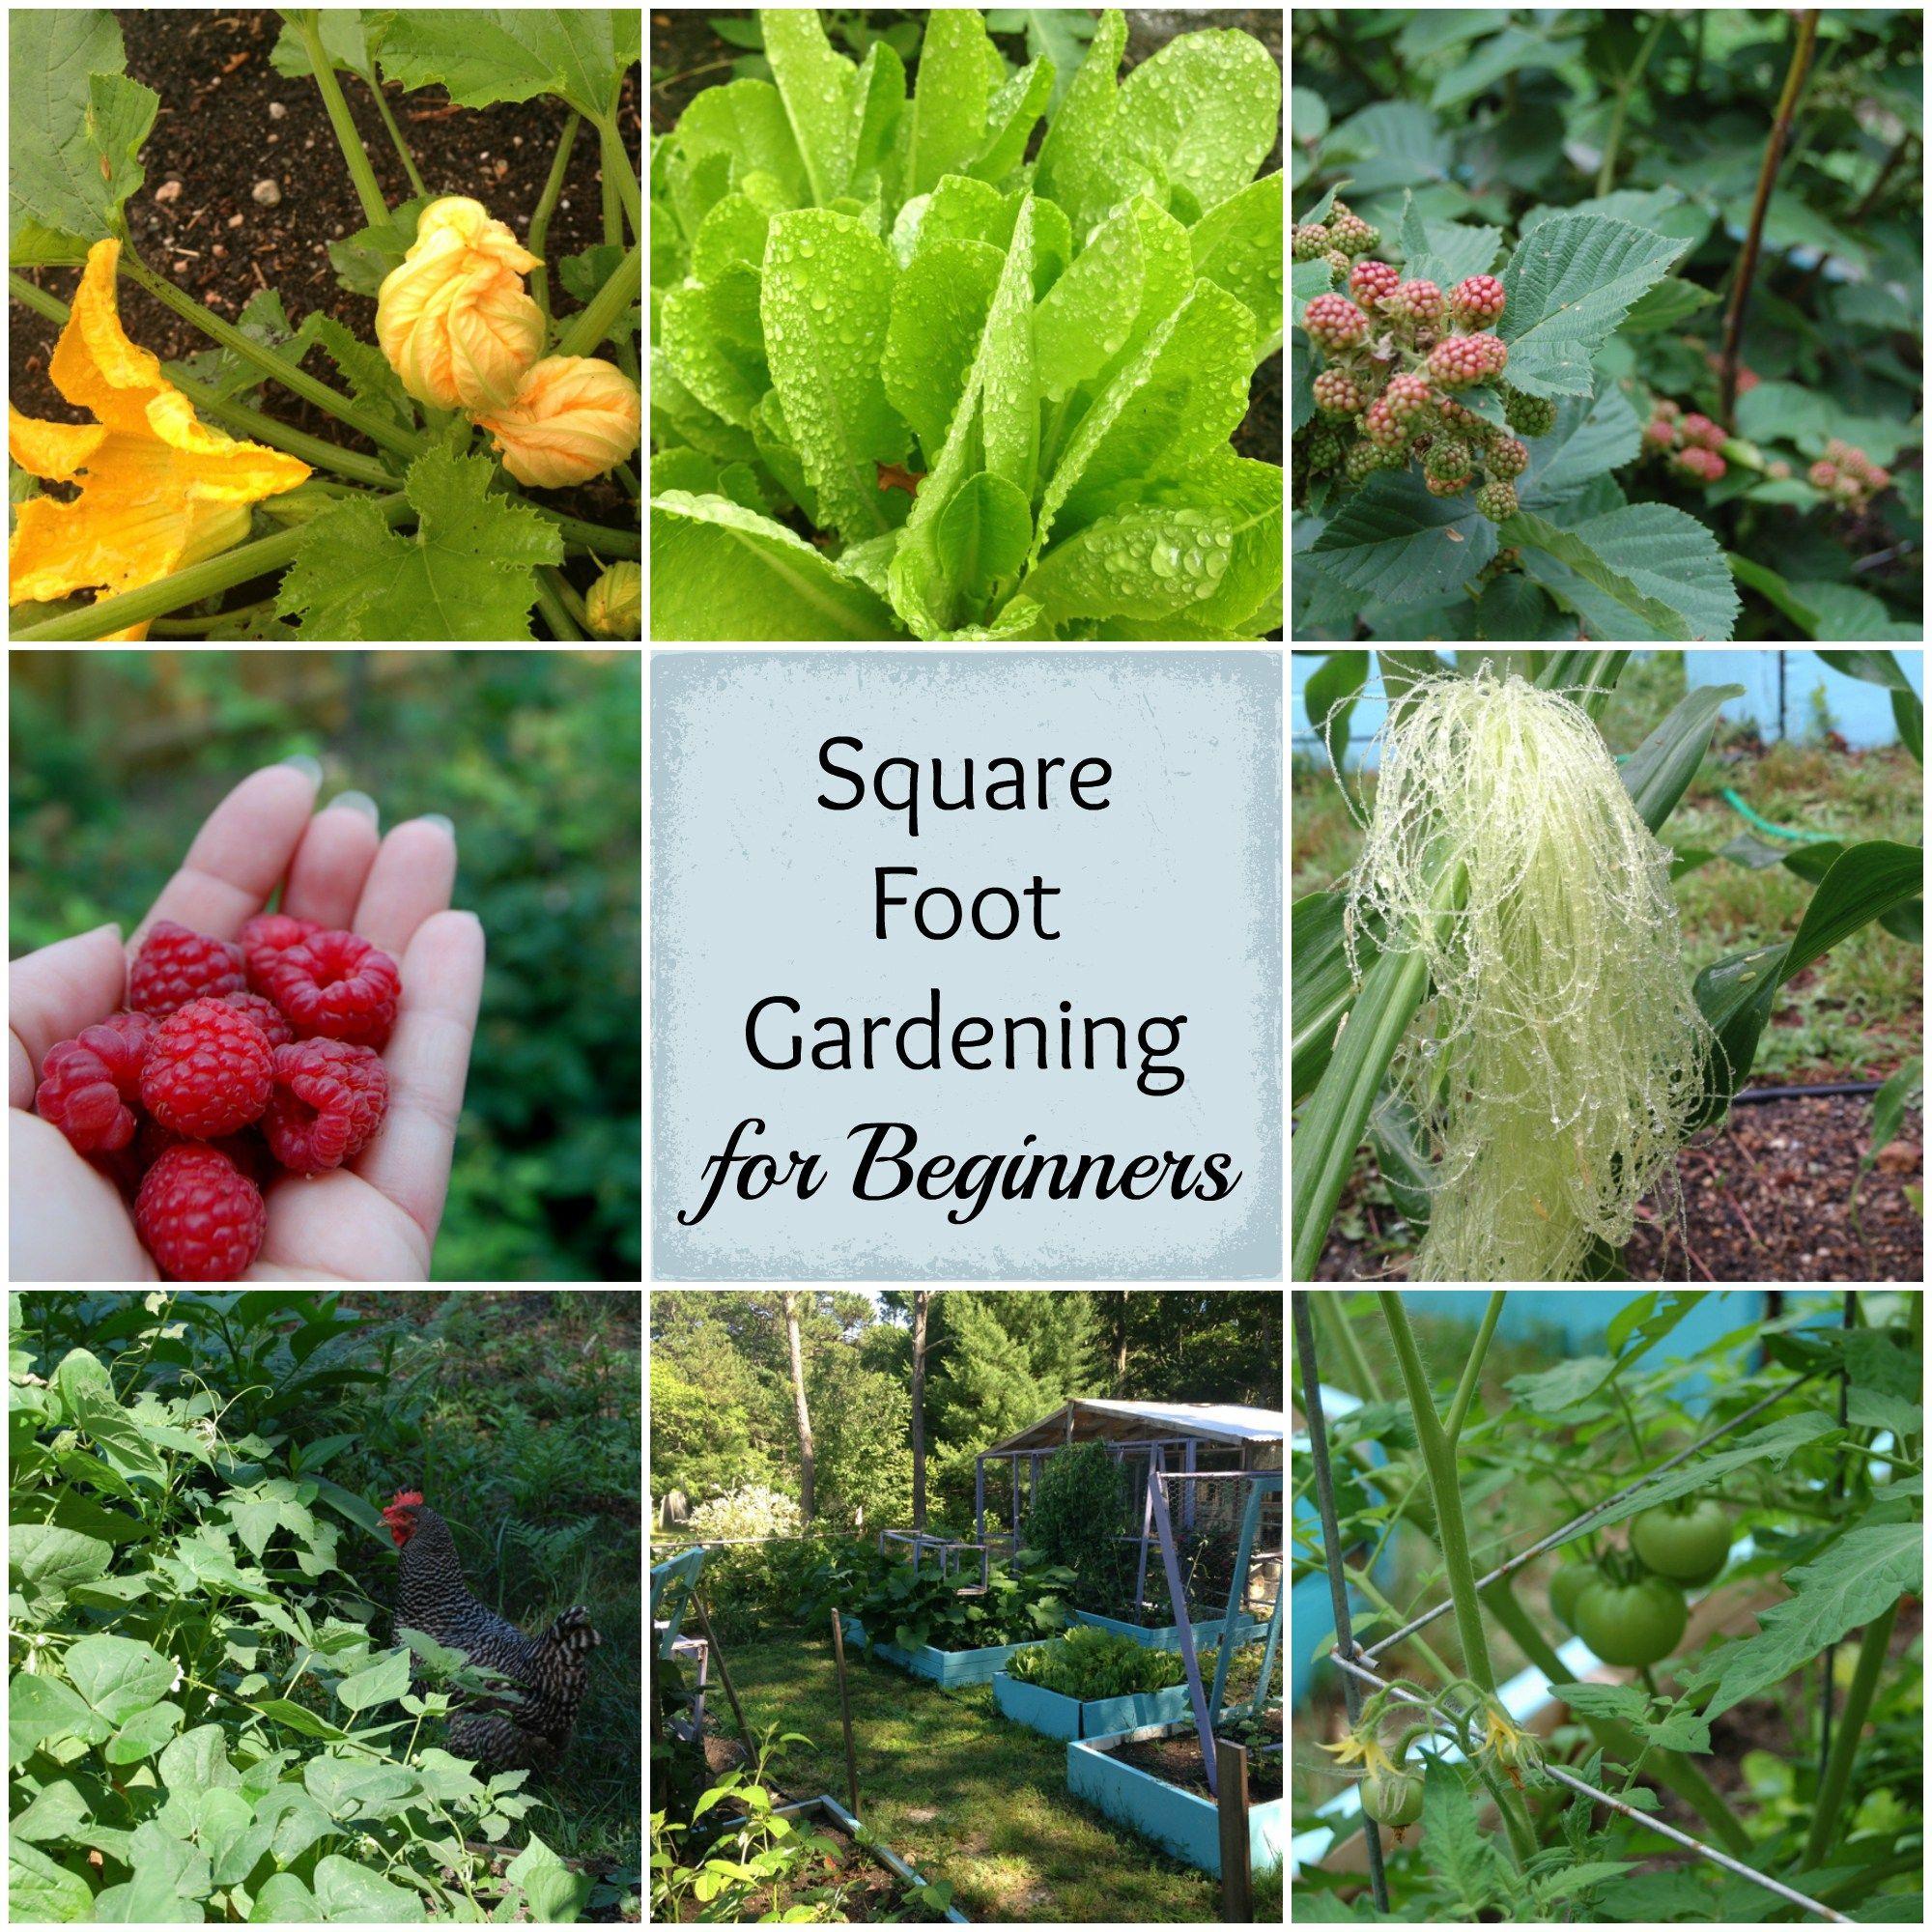 24 Fantastic Backyard Vegetable Garden Ideas: Beginners Guide To Square Foot Gardening